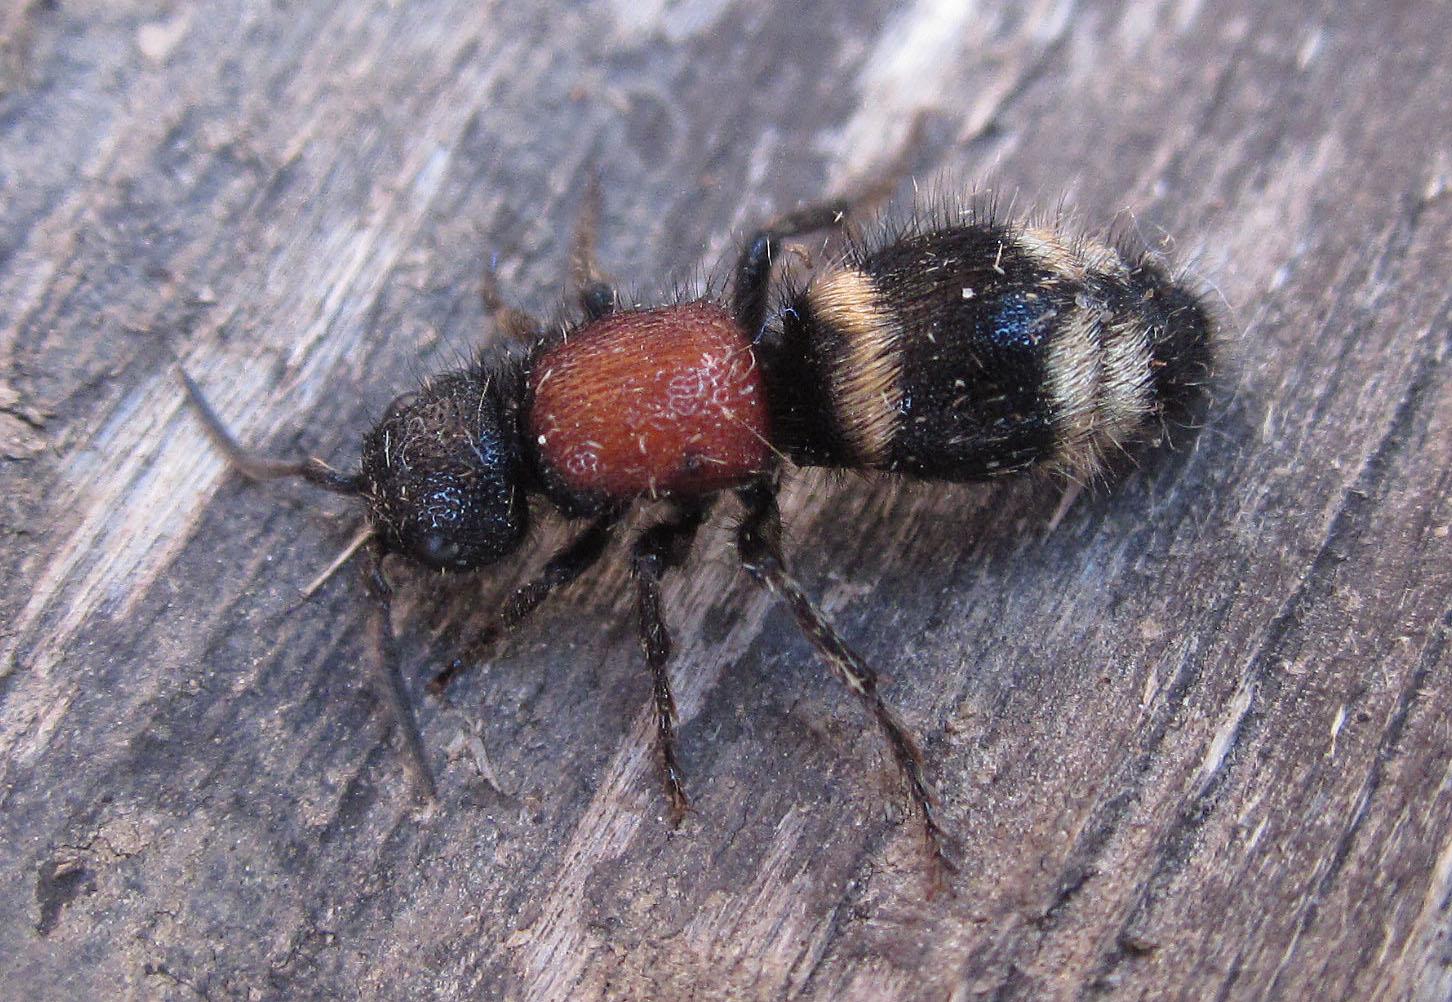 Large Velvet Ant Copyright: Clive Atkins